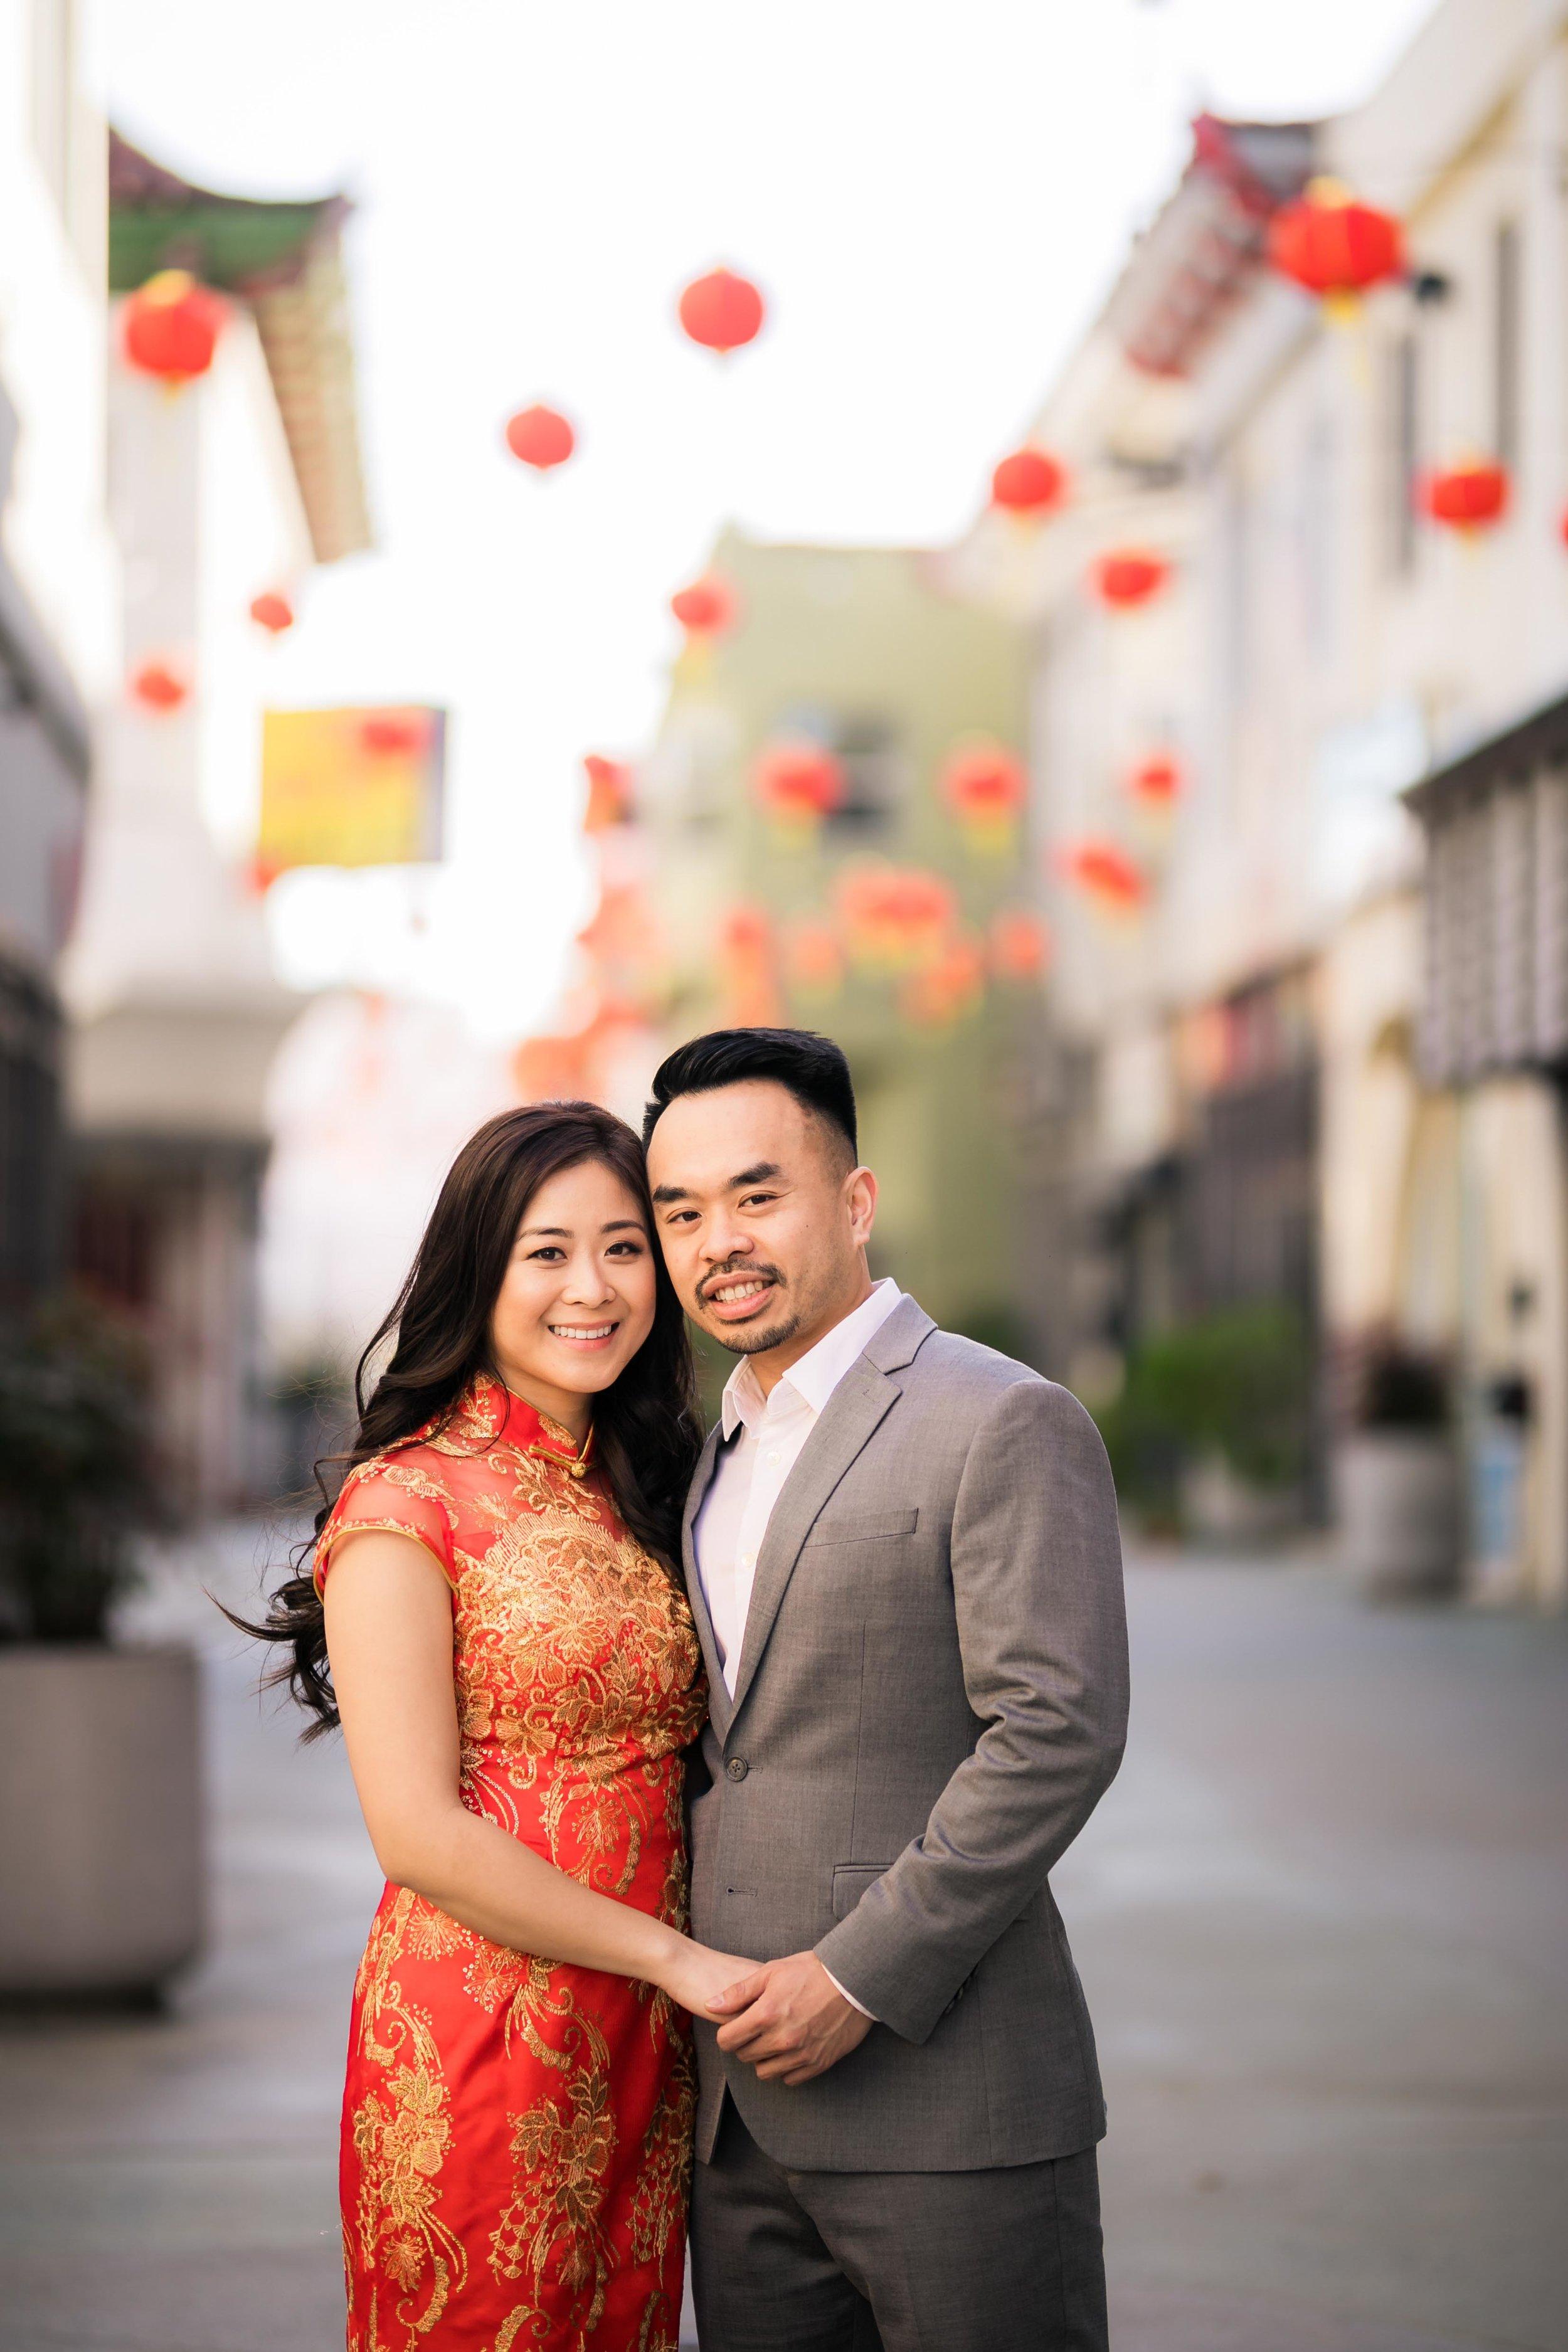 chinese_los_angeles_california_wedding_joshuachun_photography-1.JPG